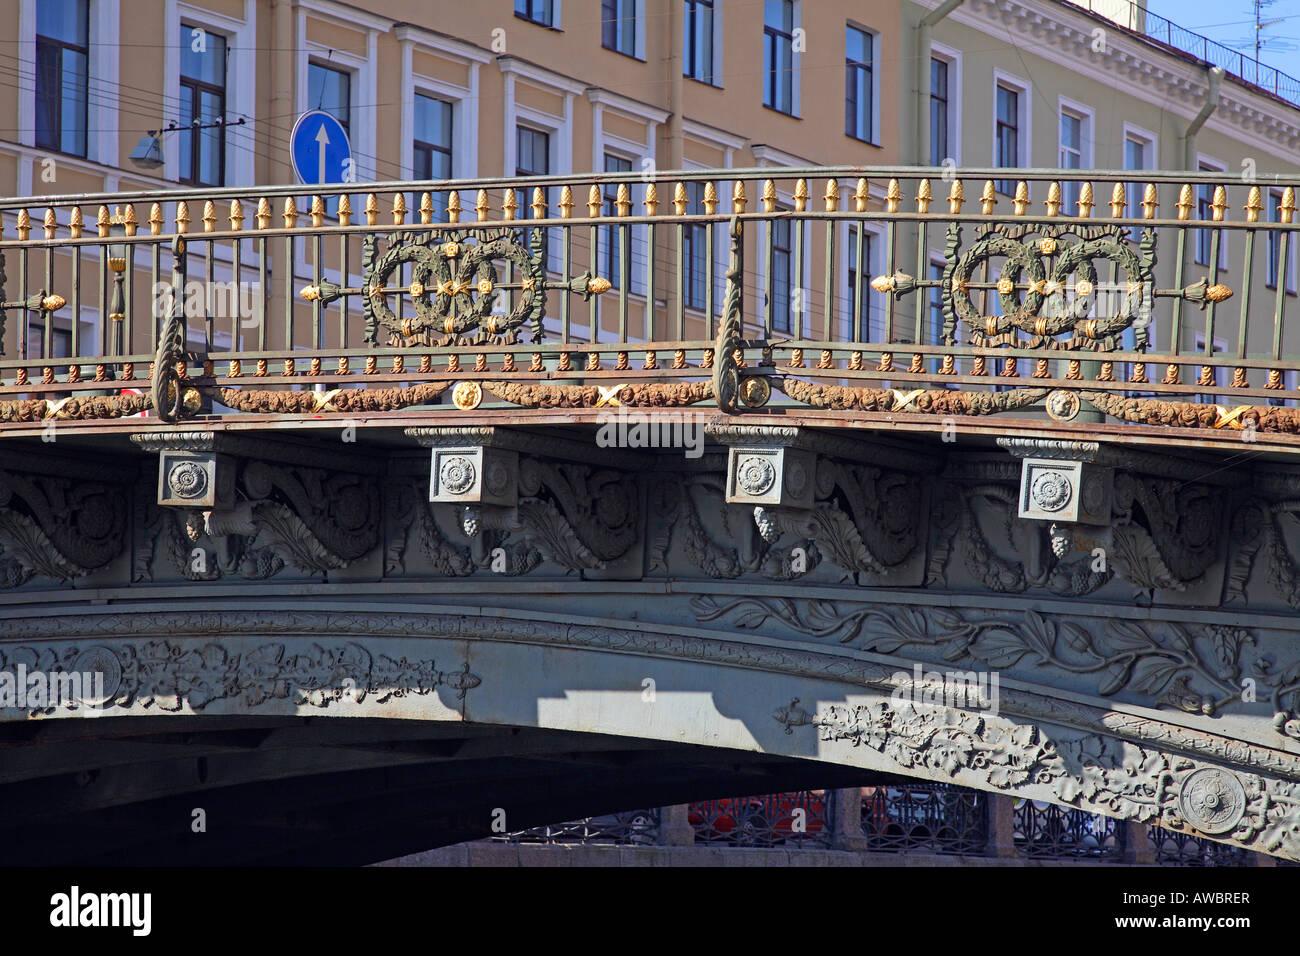 La Russie, Saint-Pétersbourg, Grandes Ecuries Bridge (bol-konyushennyy la plupart), la rivière Moïka Photo Stock